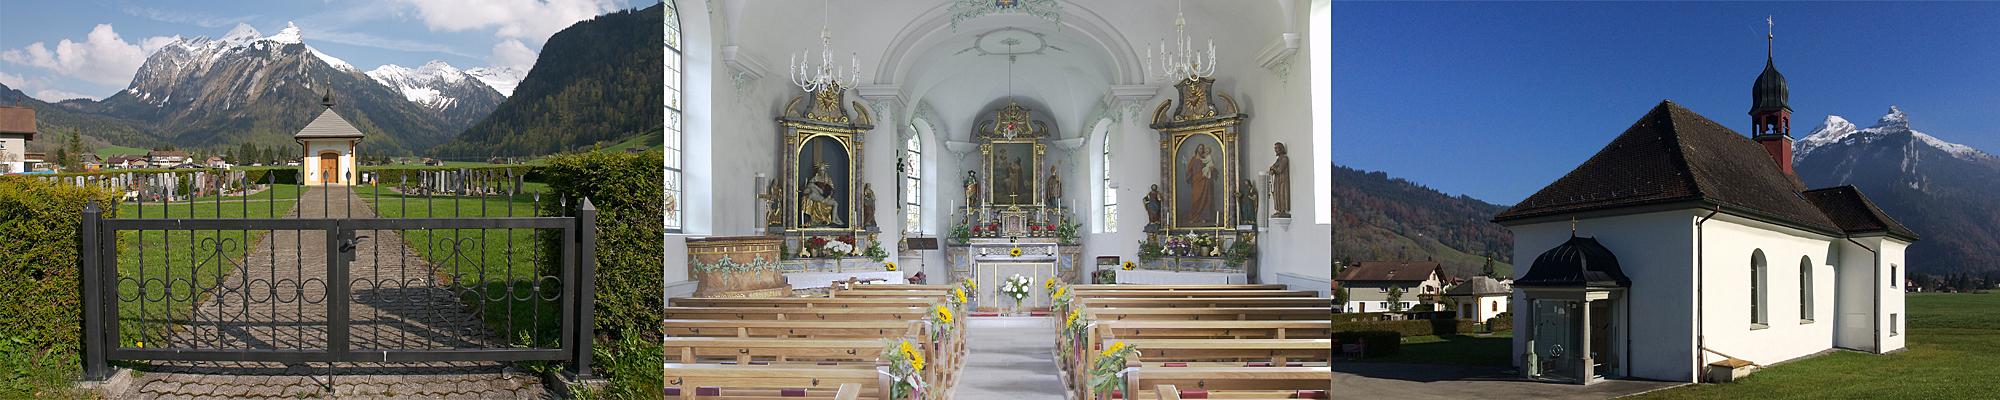 Pfarrei St. Wendelin, Studen